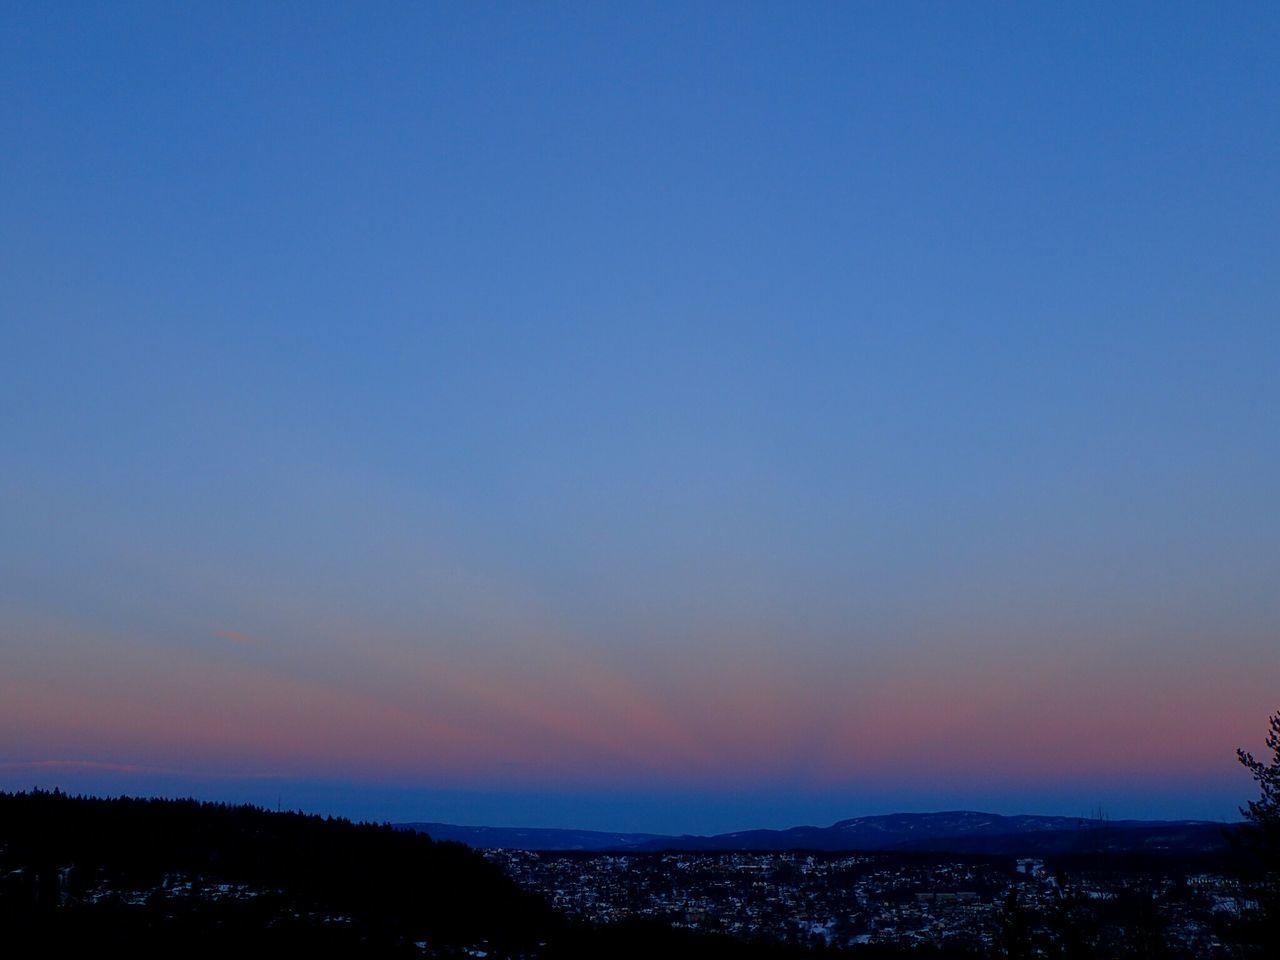 💖💙💜wHaT a suNset todaY💜💙💖 Kongsbergskisenter Sunrise_sunsets_aroundworld Sunset_collection Sunset Hello World Ilovesunsets Ilovewinter Ilovenorway Damgooddays